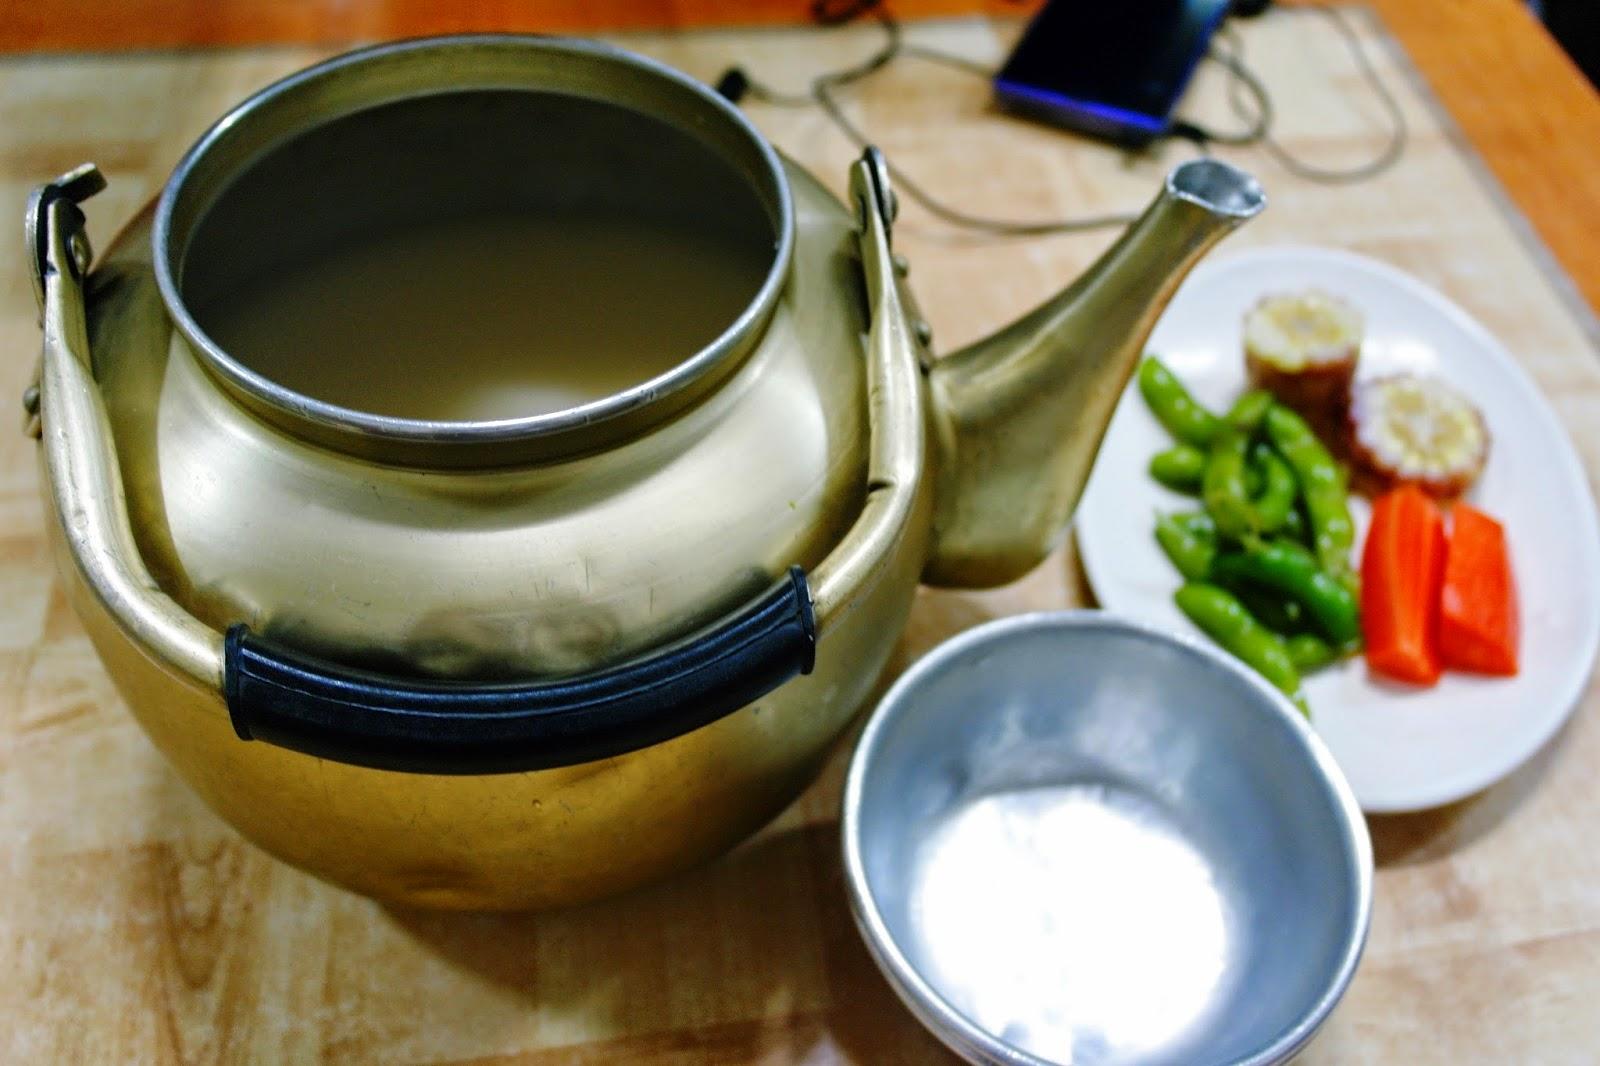 Jeonju Gain Makgeolli House 가인막걸리 | meheartsoul.blogspot.com